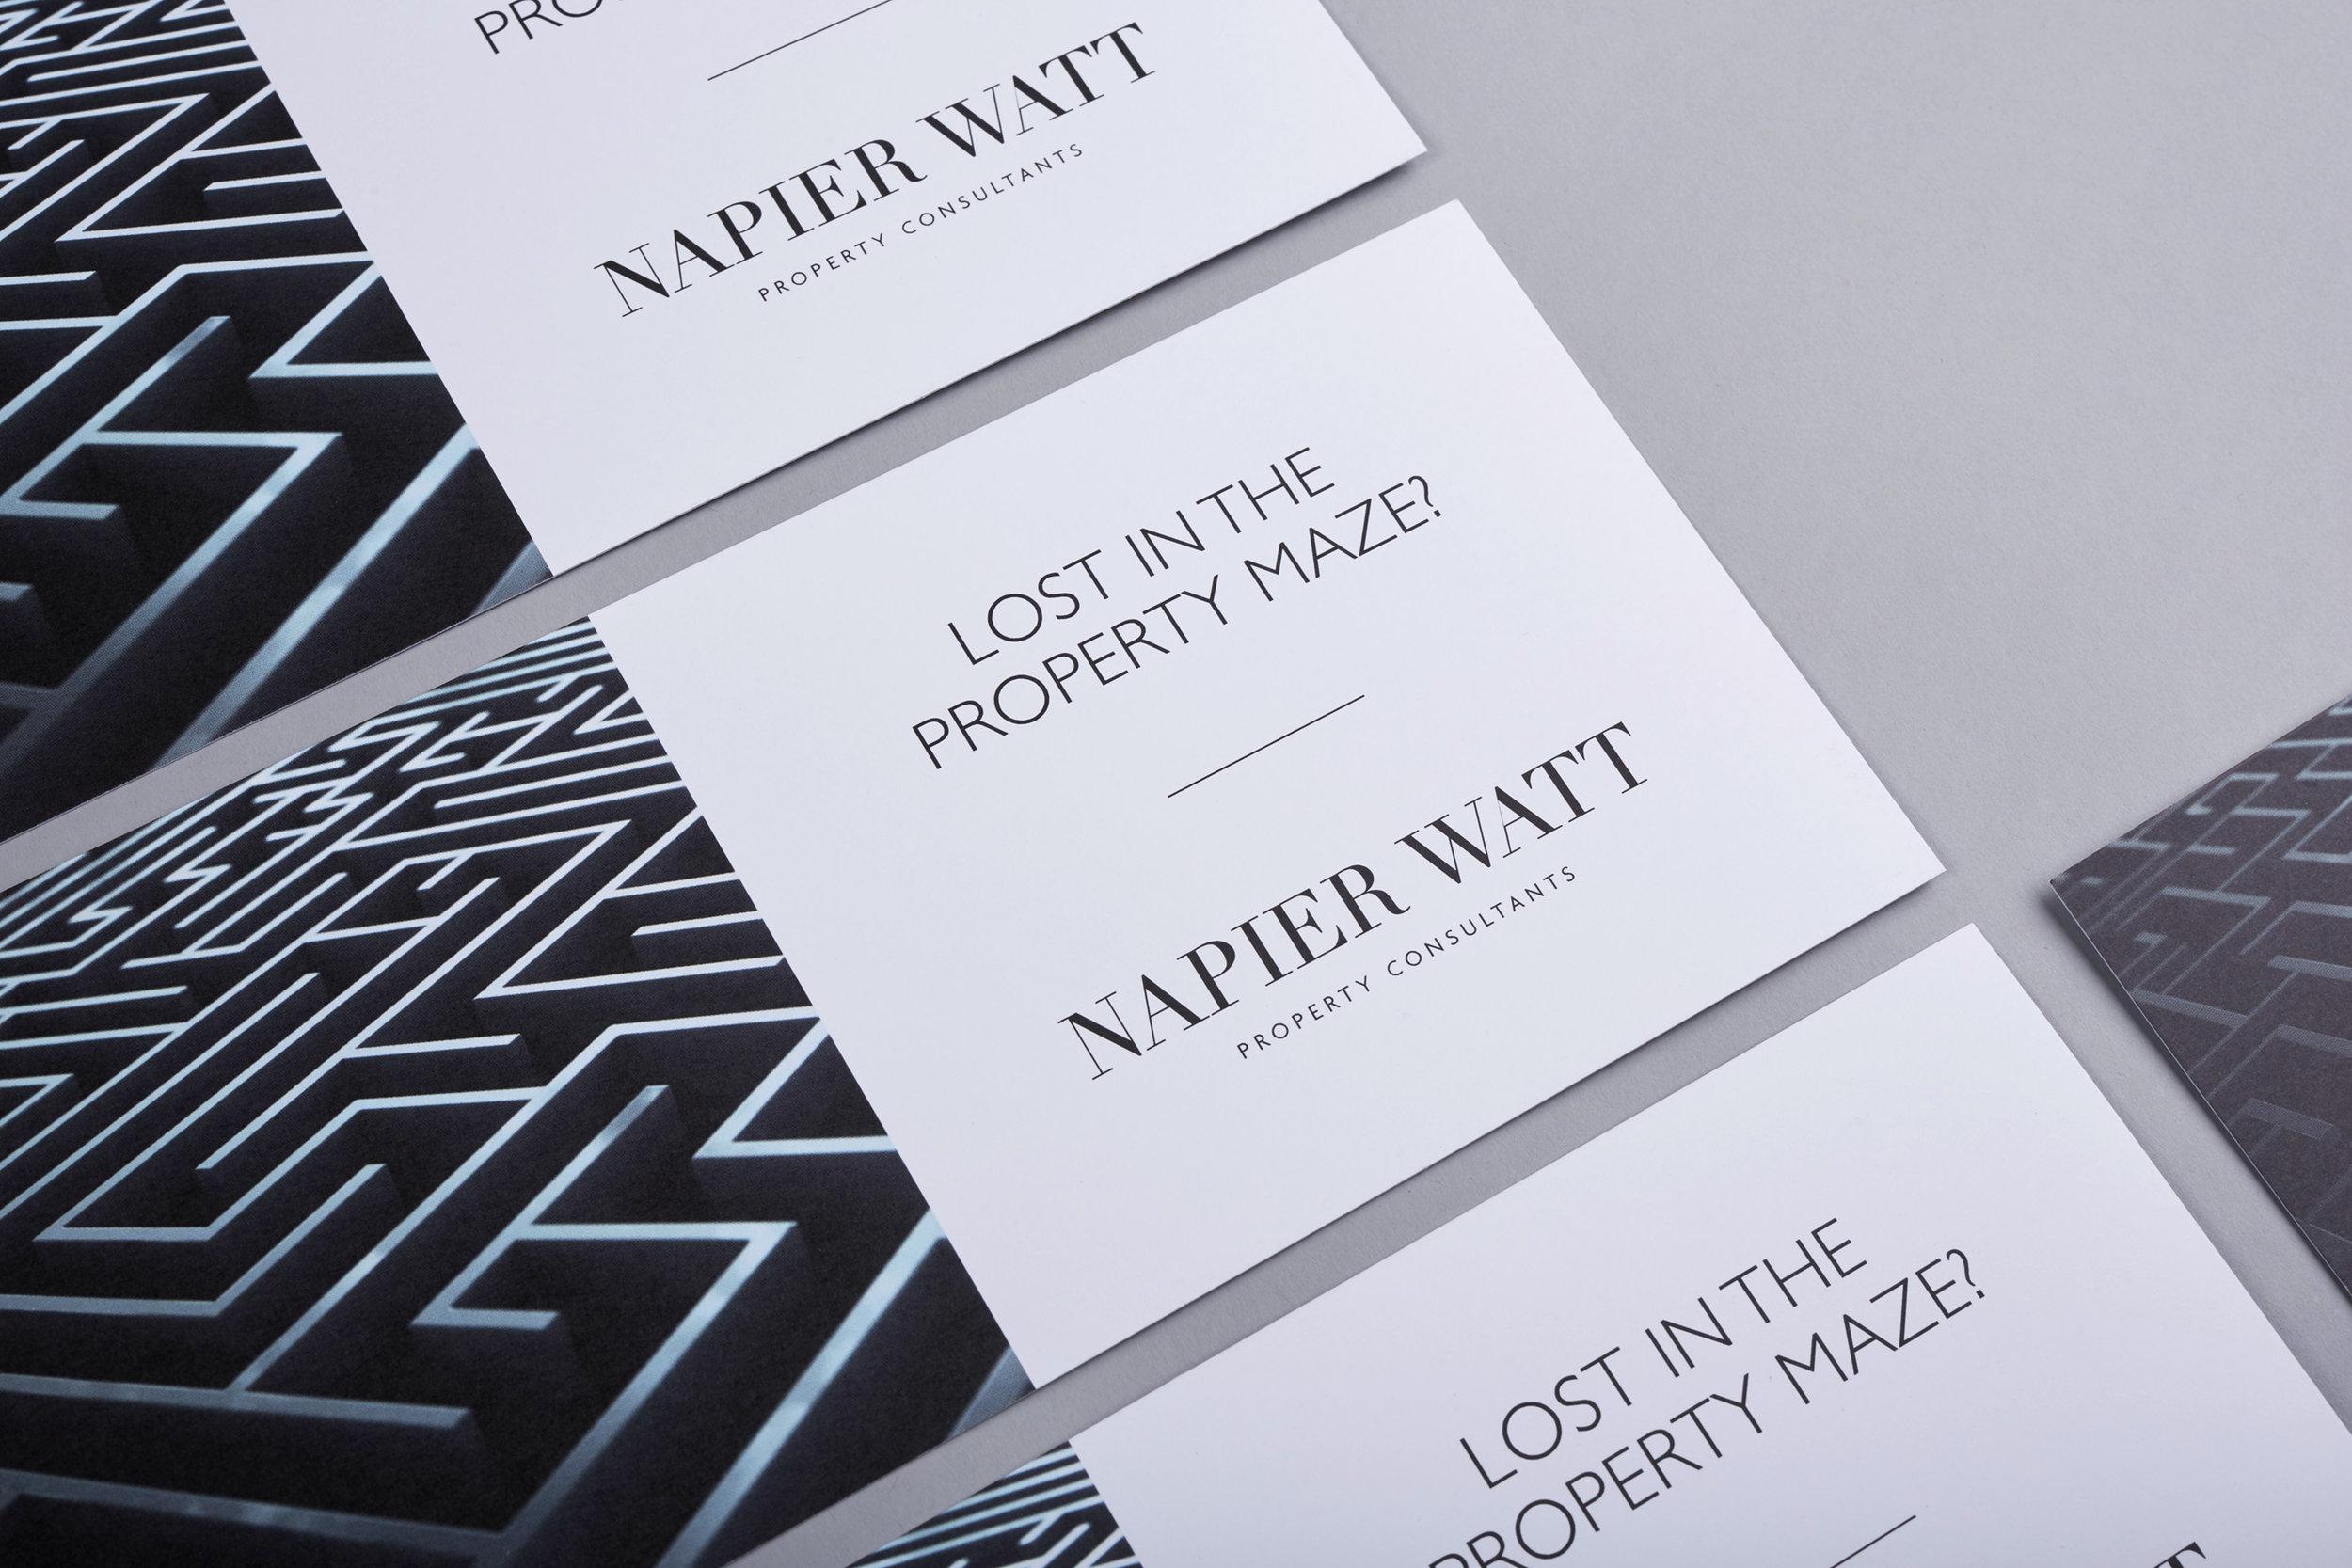 Splendid Design Napier Watt Business Cards.jpg